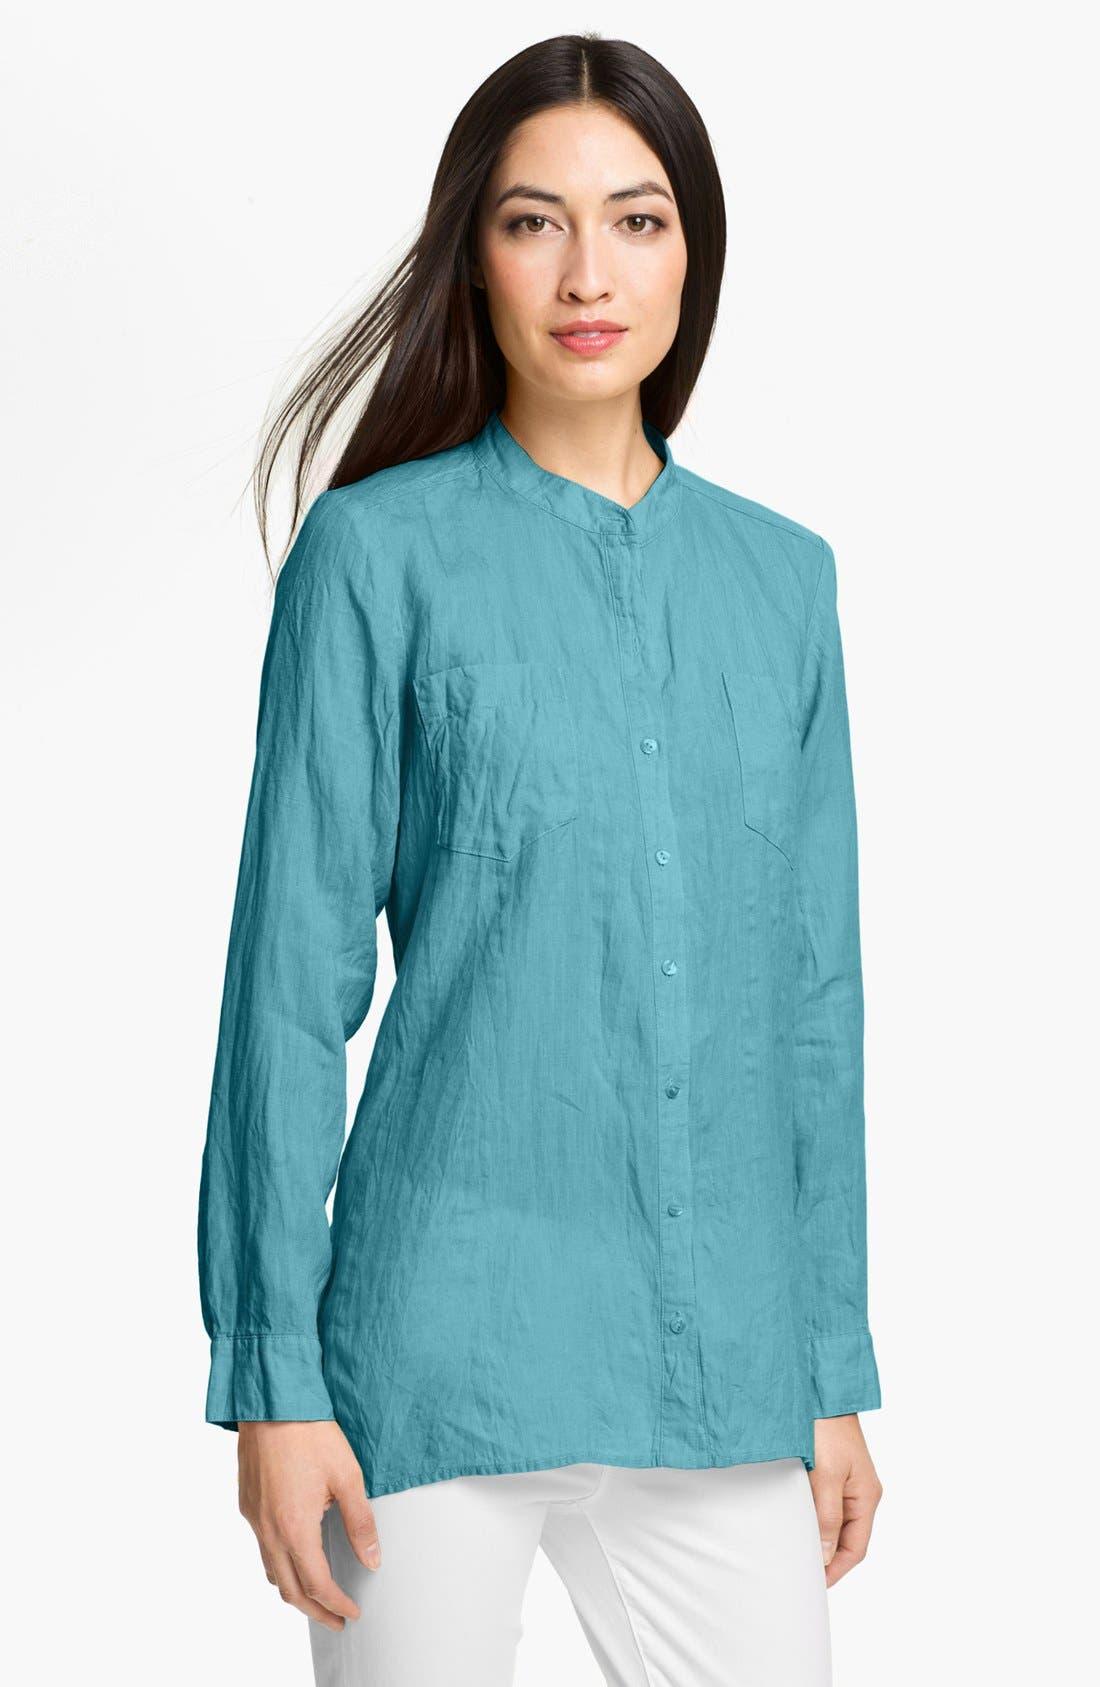 Alternate Image 1 Selected - Eileen Fisher Mandarin Collar Organic Linen Shirt